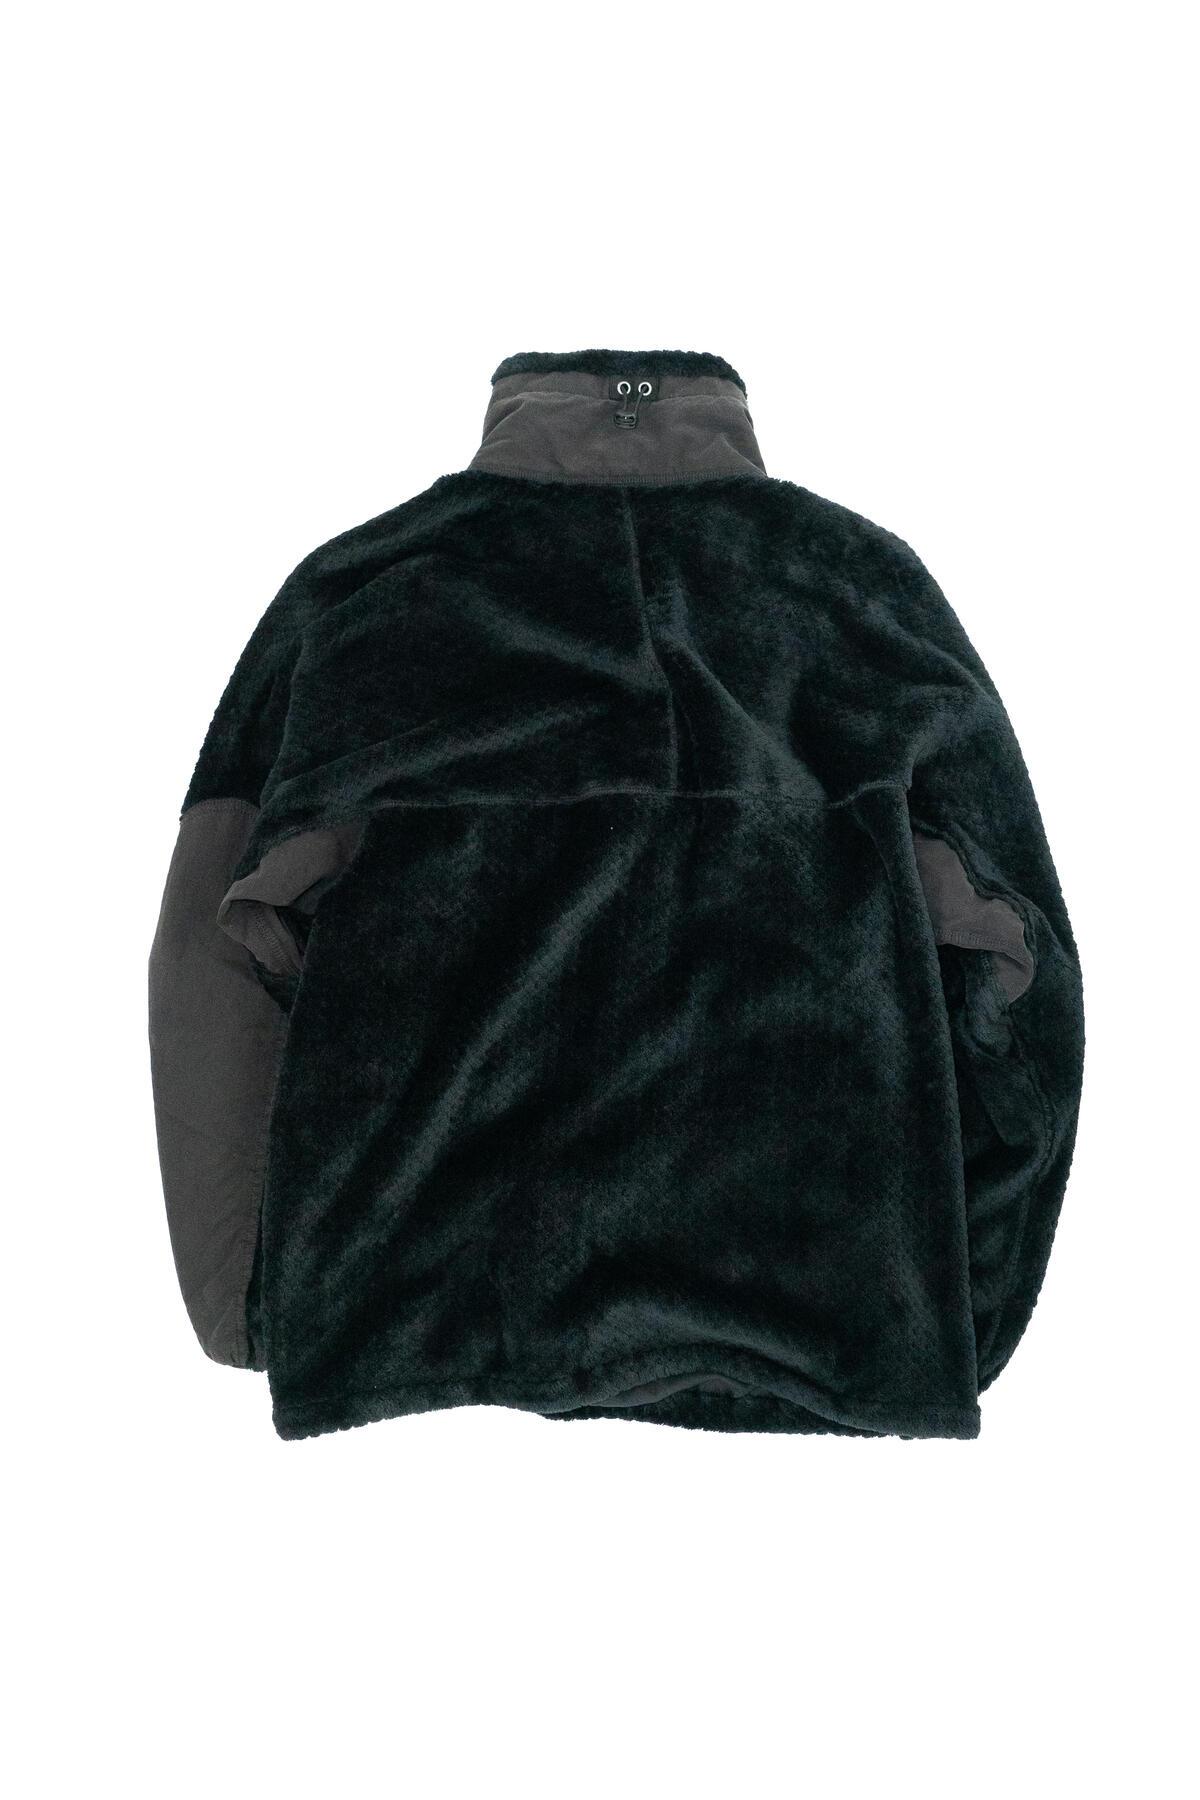 RXMF20ROX-9 BLACK back